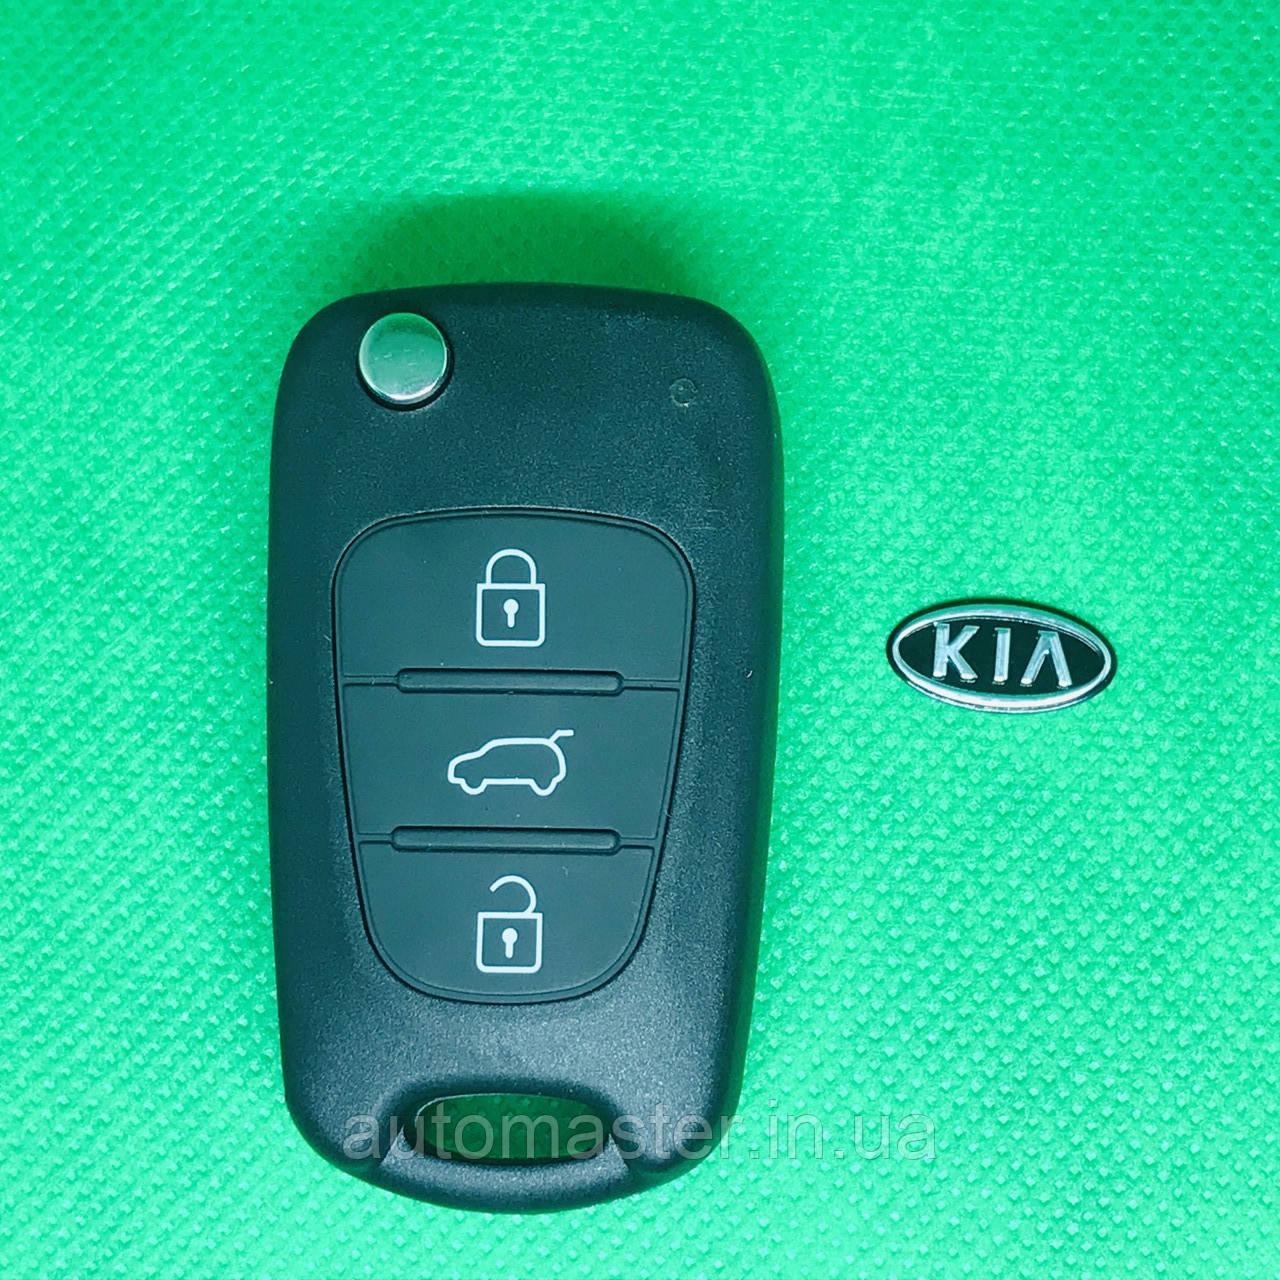 Корпус автоключа для KIA Sorento, Ceed, Cerato, Soul (КИА Соренто, Сид, Черато, Соул) 3 кнопки